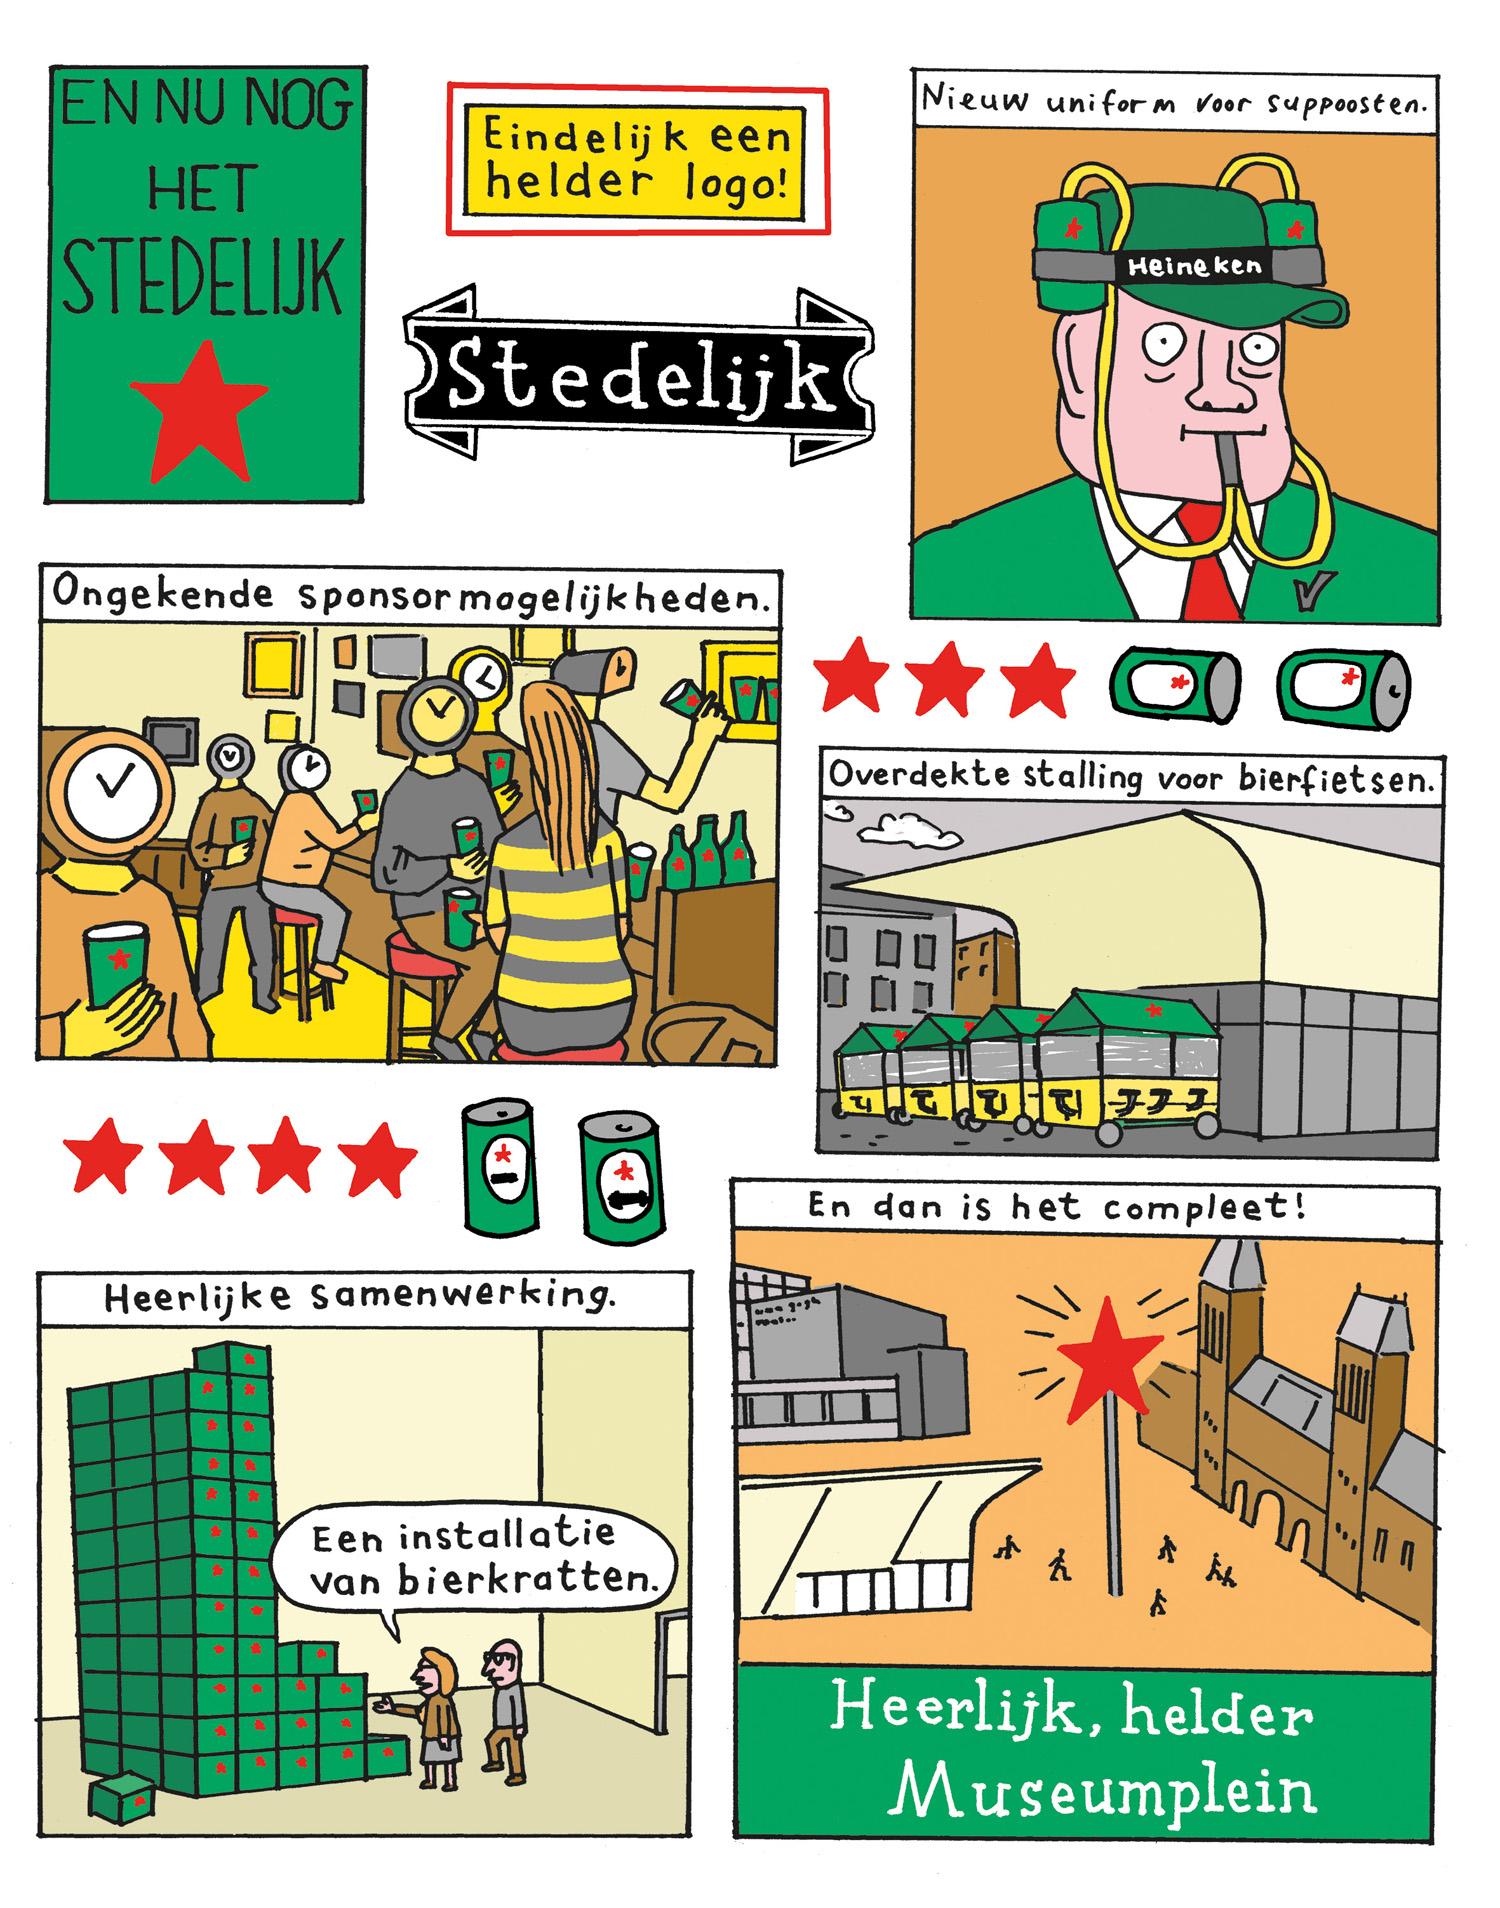 Origine_7 Heineken lowres.jpg